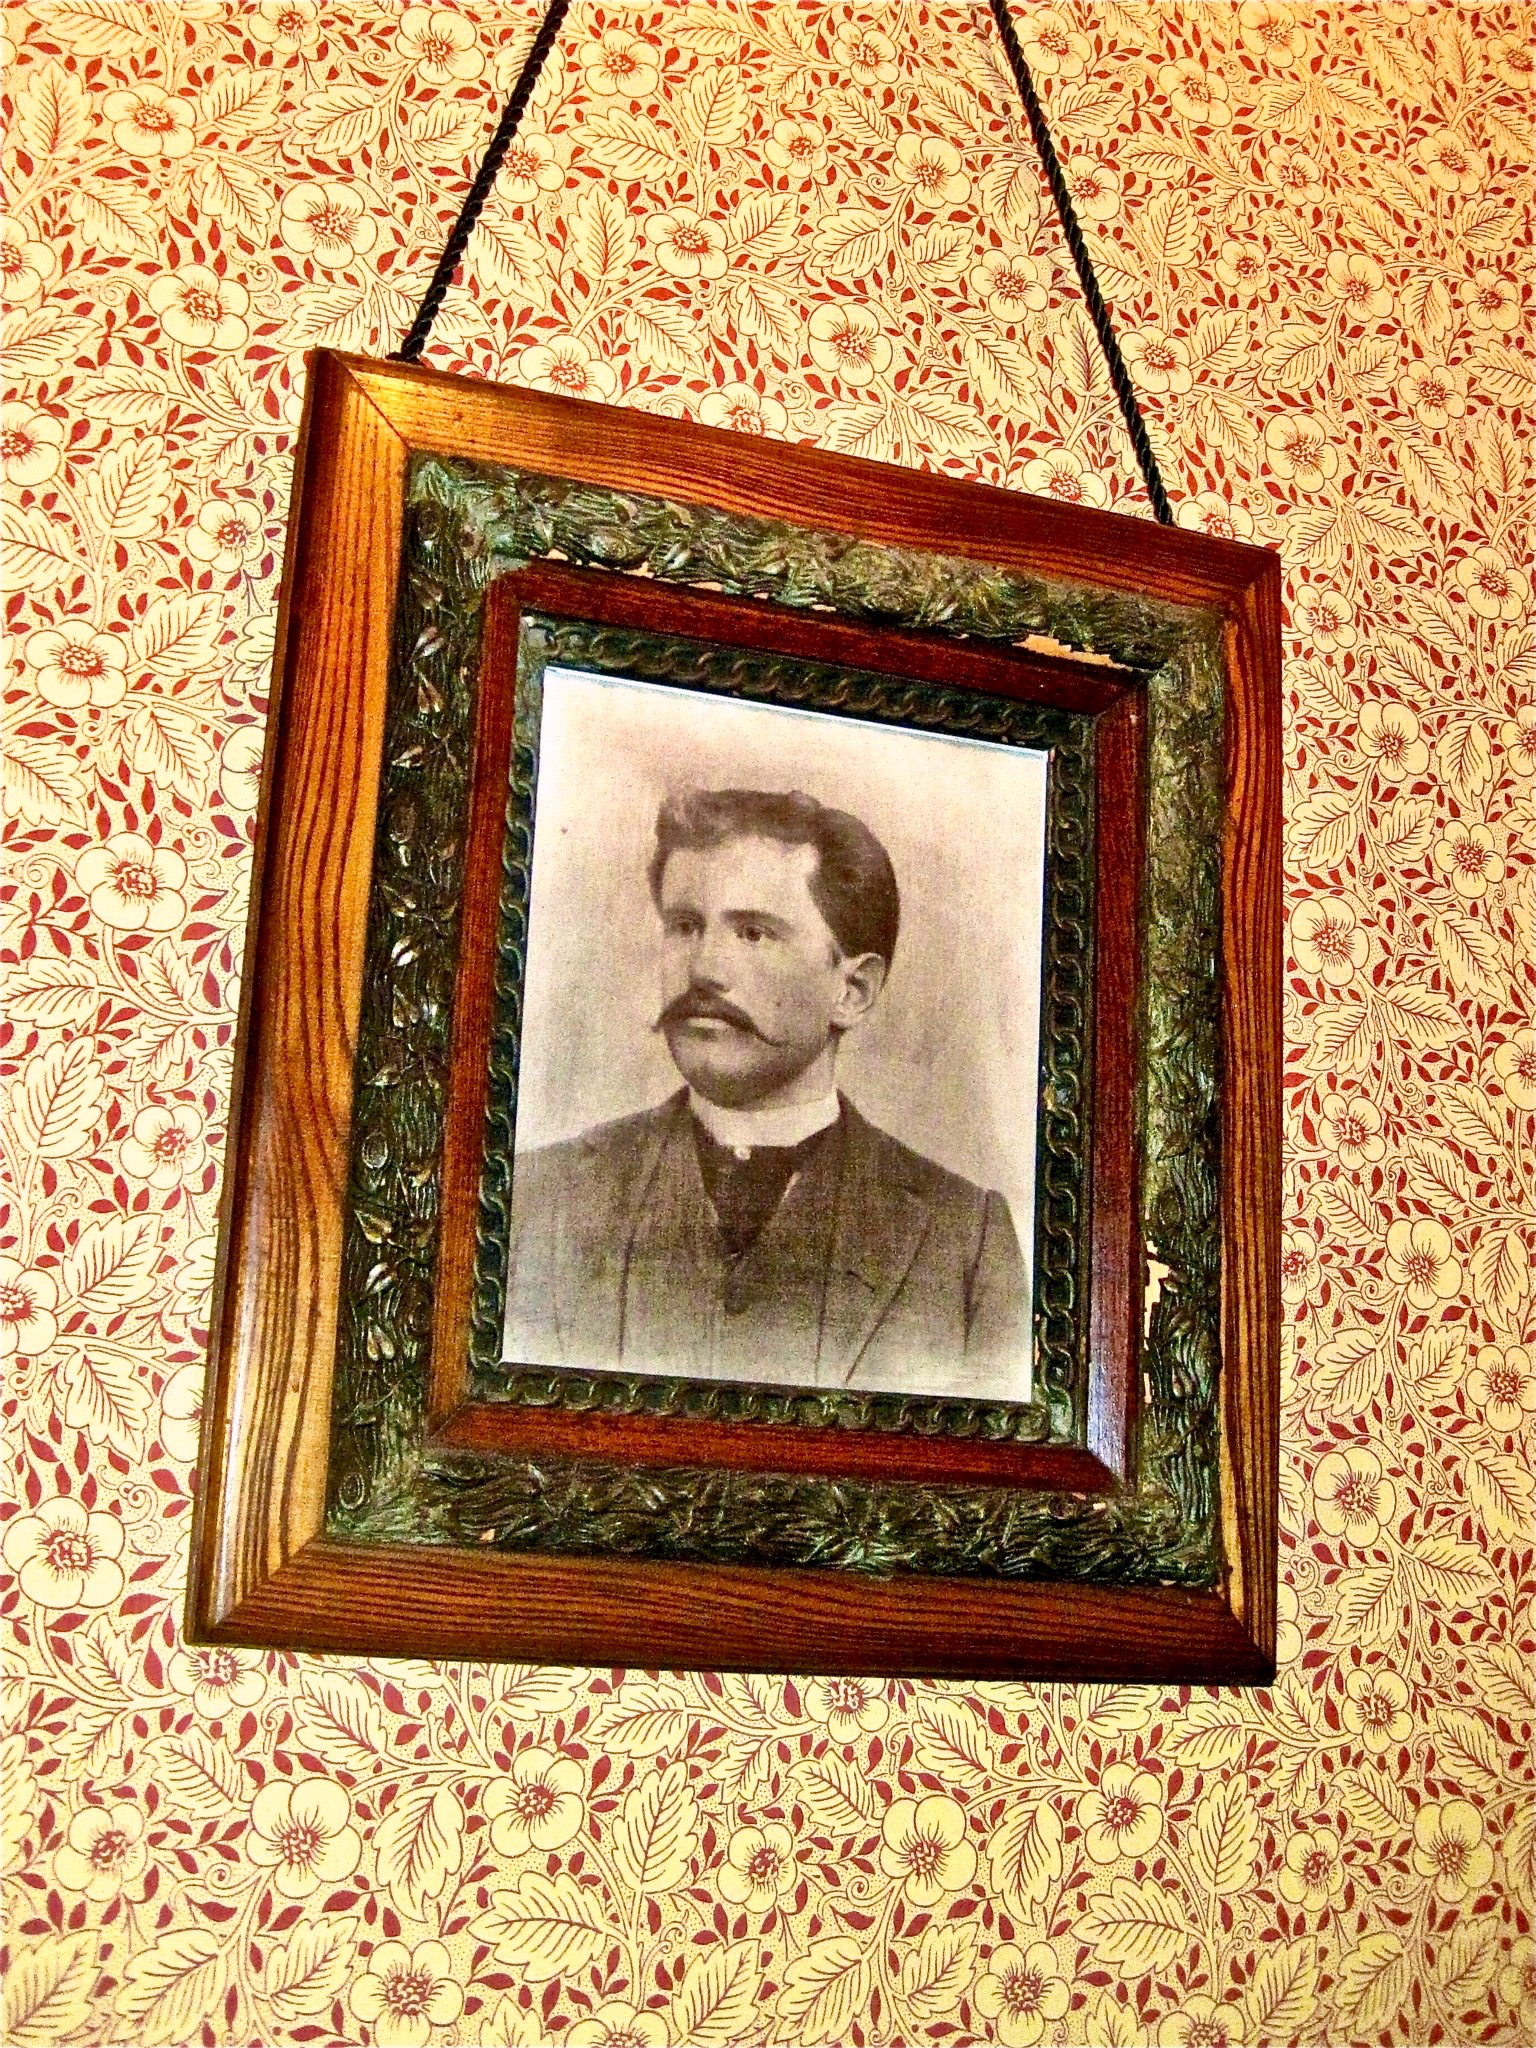 O. Henry Portrait